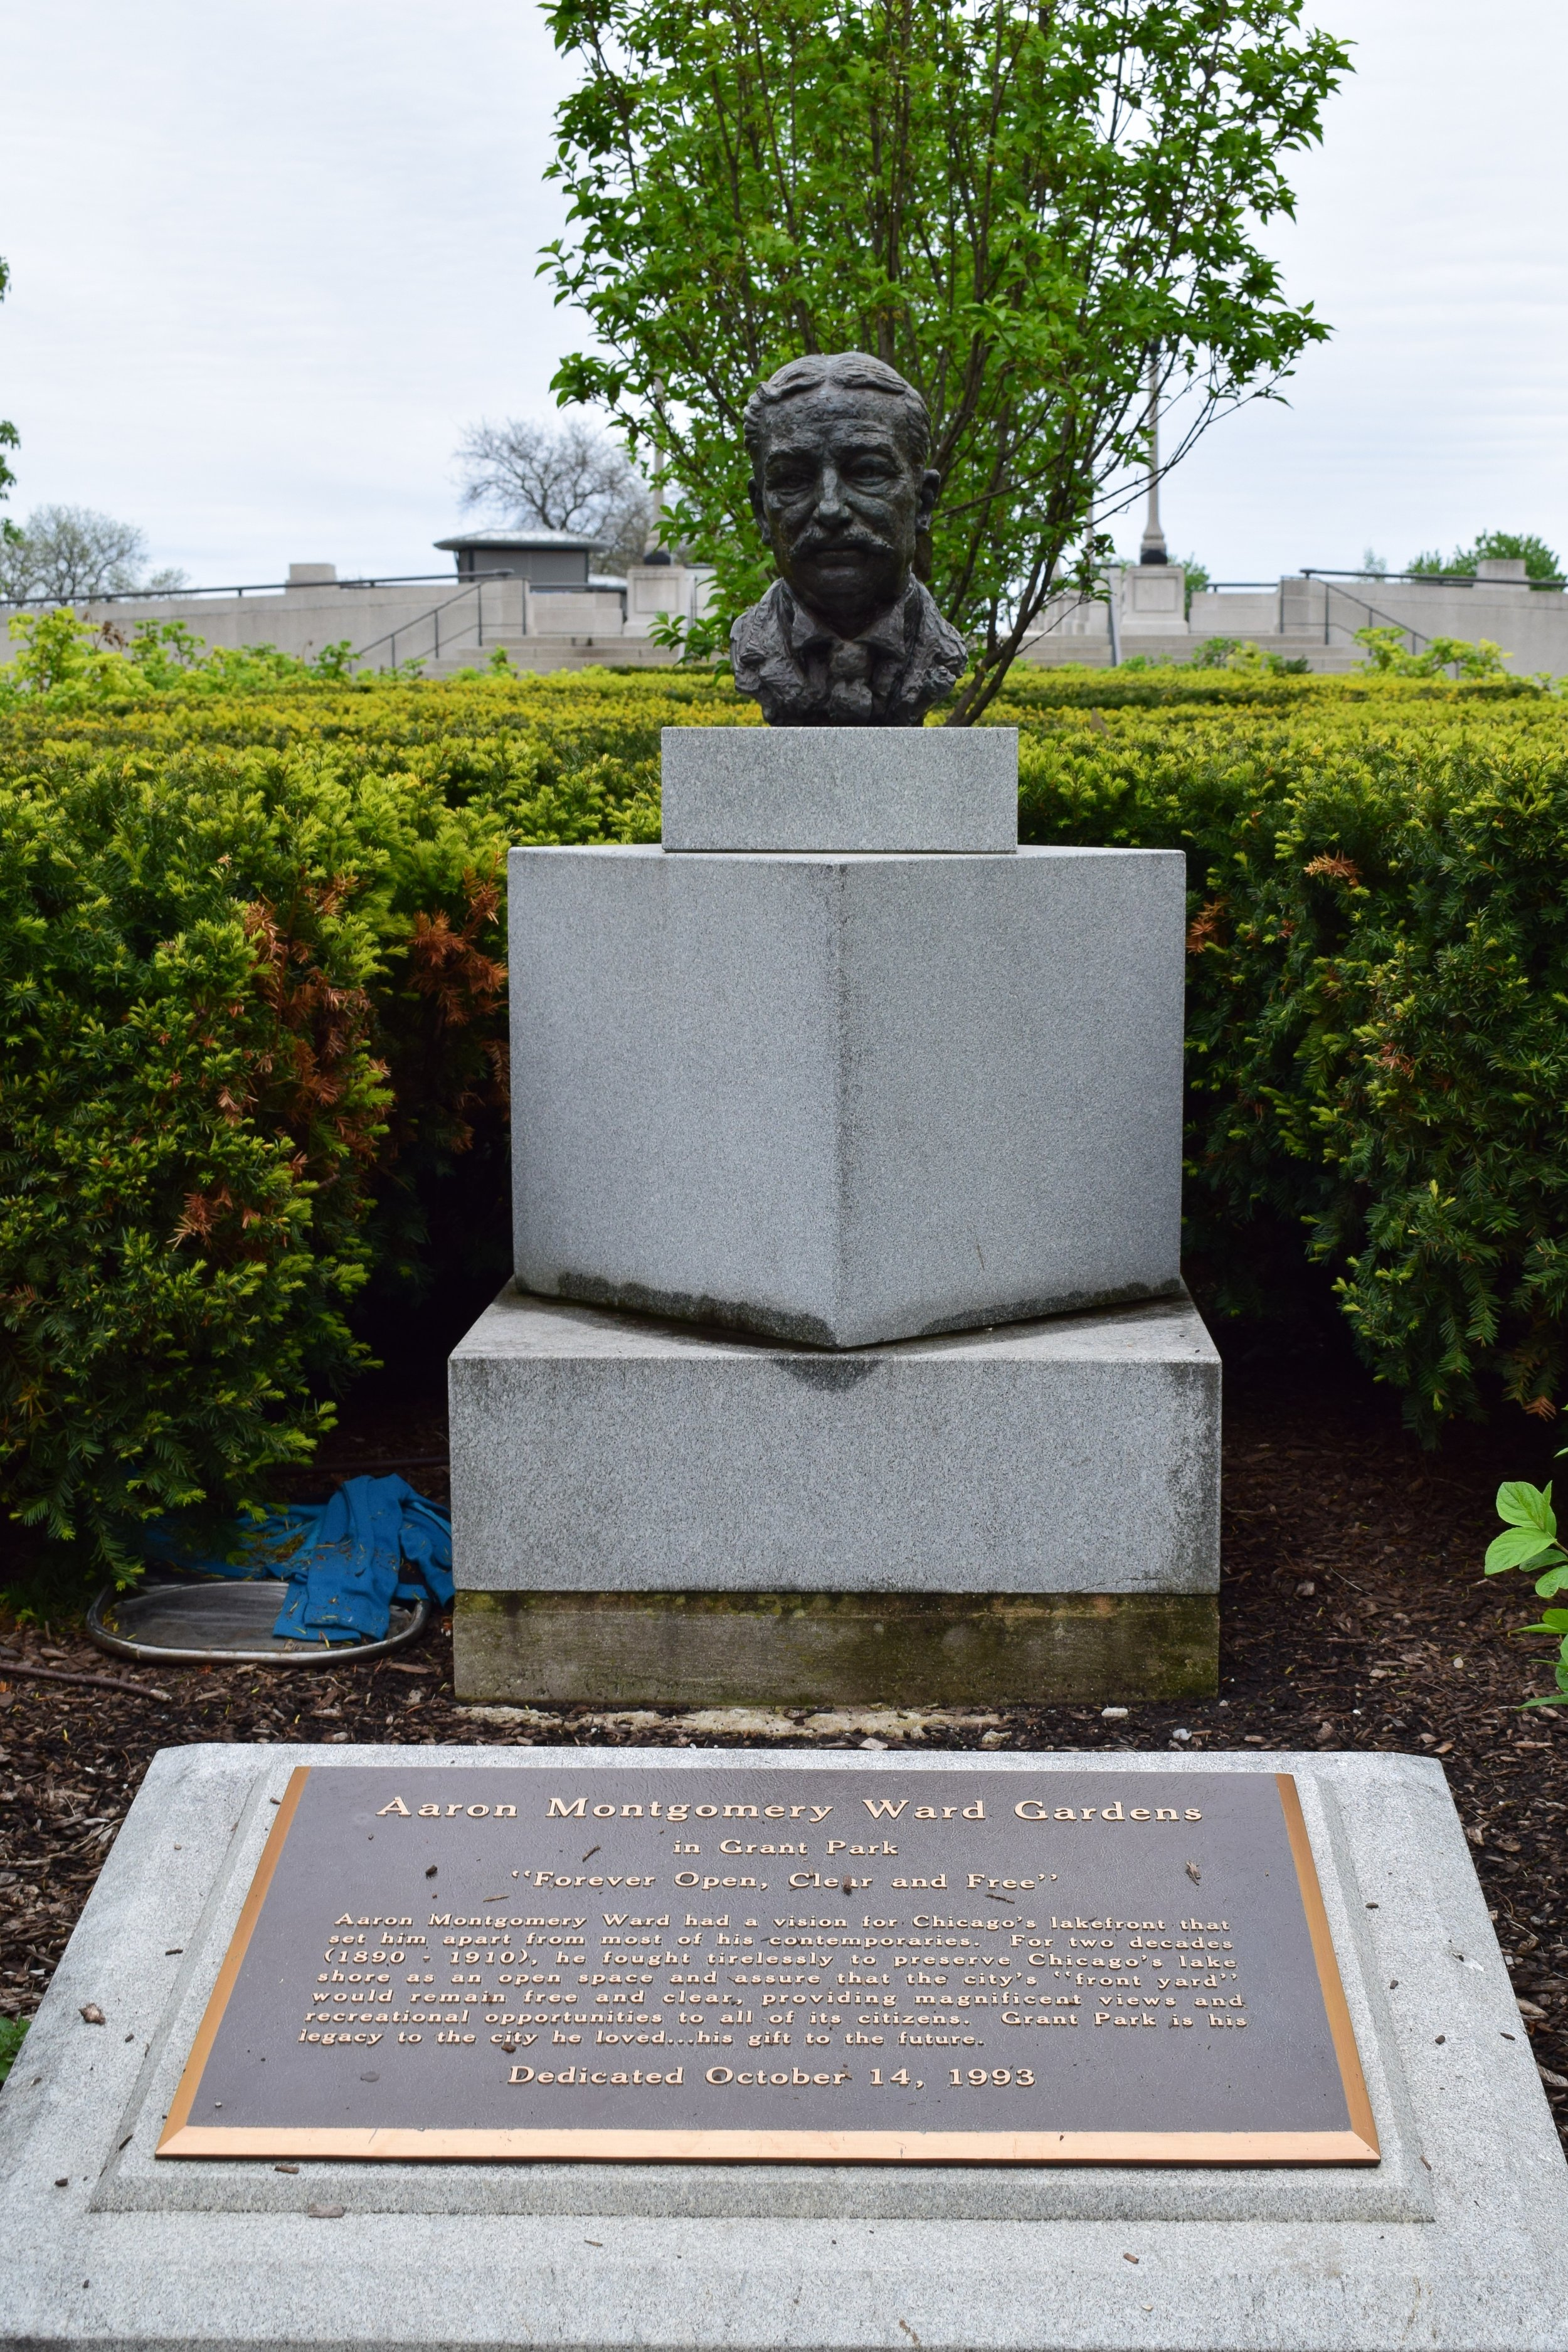 Montgomery Ward Statue in Grant Park - photo by Maren Robinson